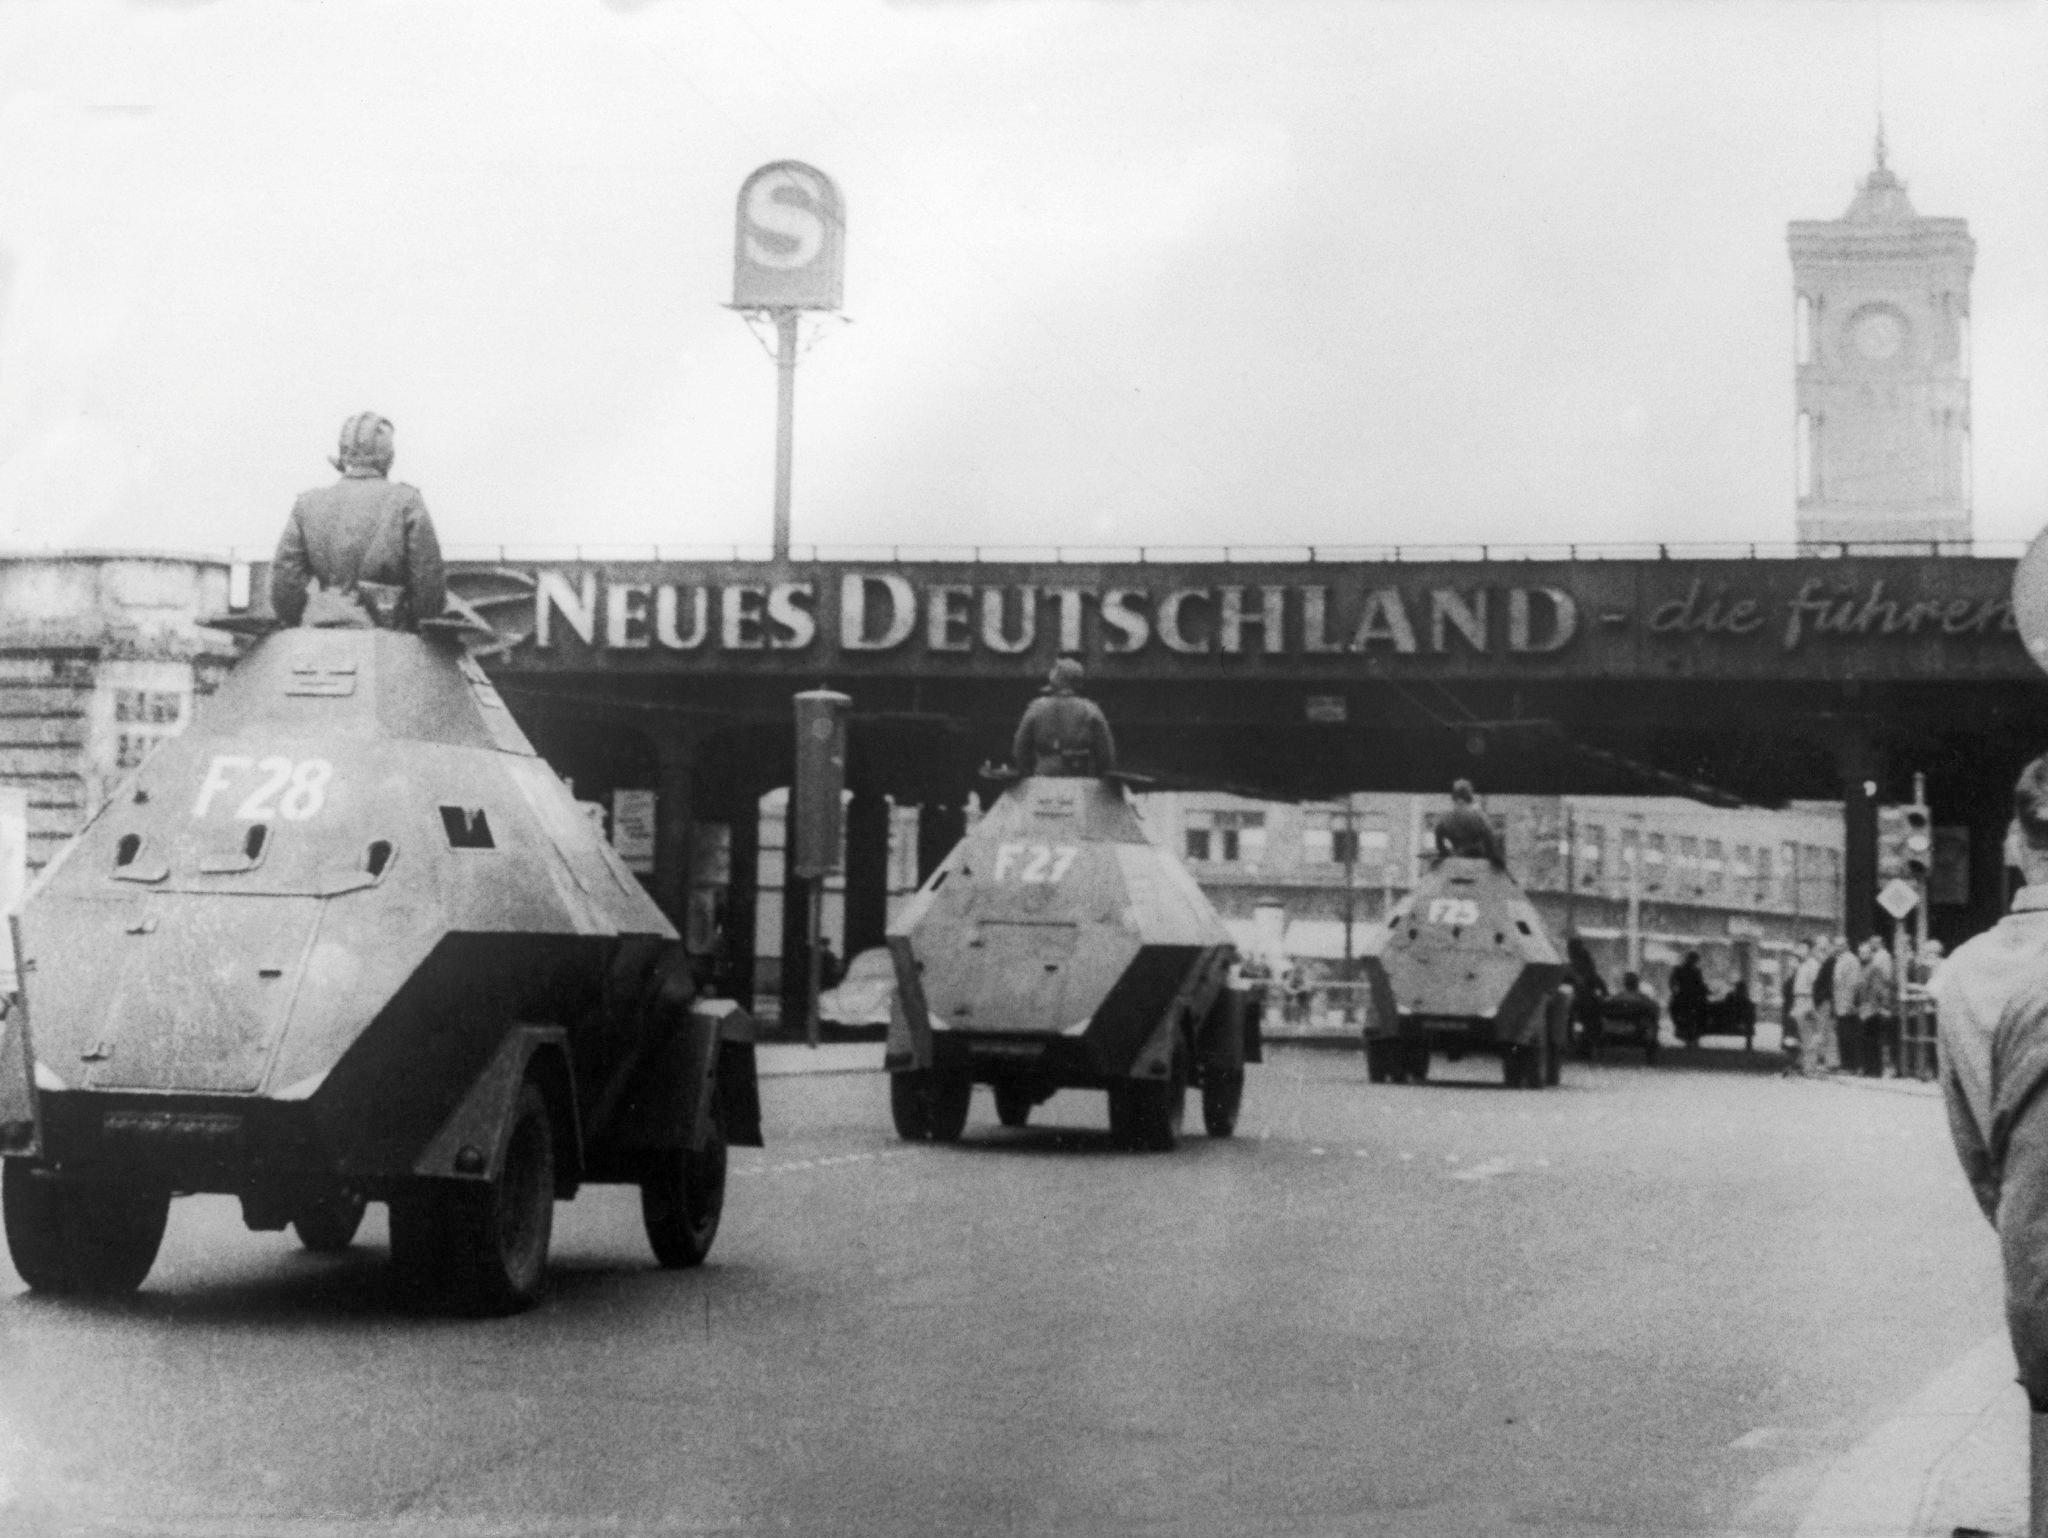 1959. Танки, пересекающие Александерплац 13 августа